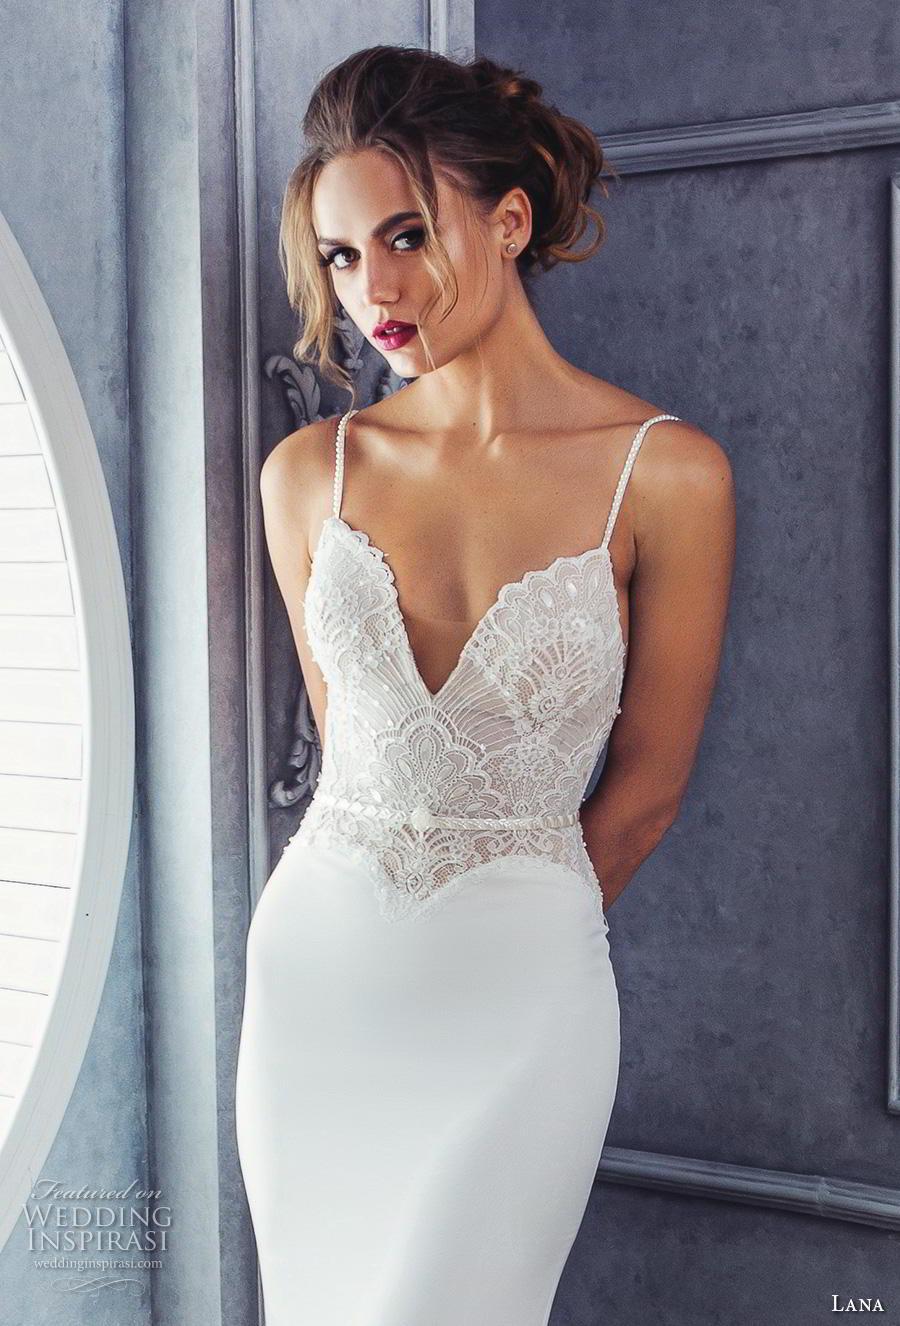 lana 2018 bridal spaghetti strap deep sweetheart neckline heavily embellished bodice satin skirt elegant sheath fit and flare wedding dress medium train (4) zv